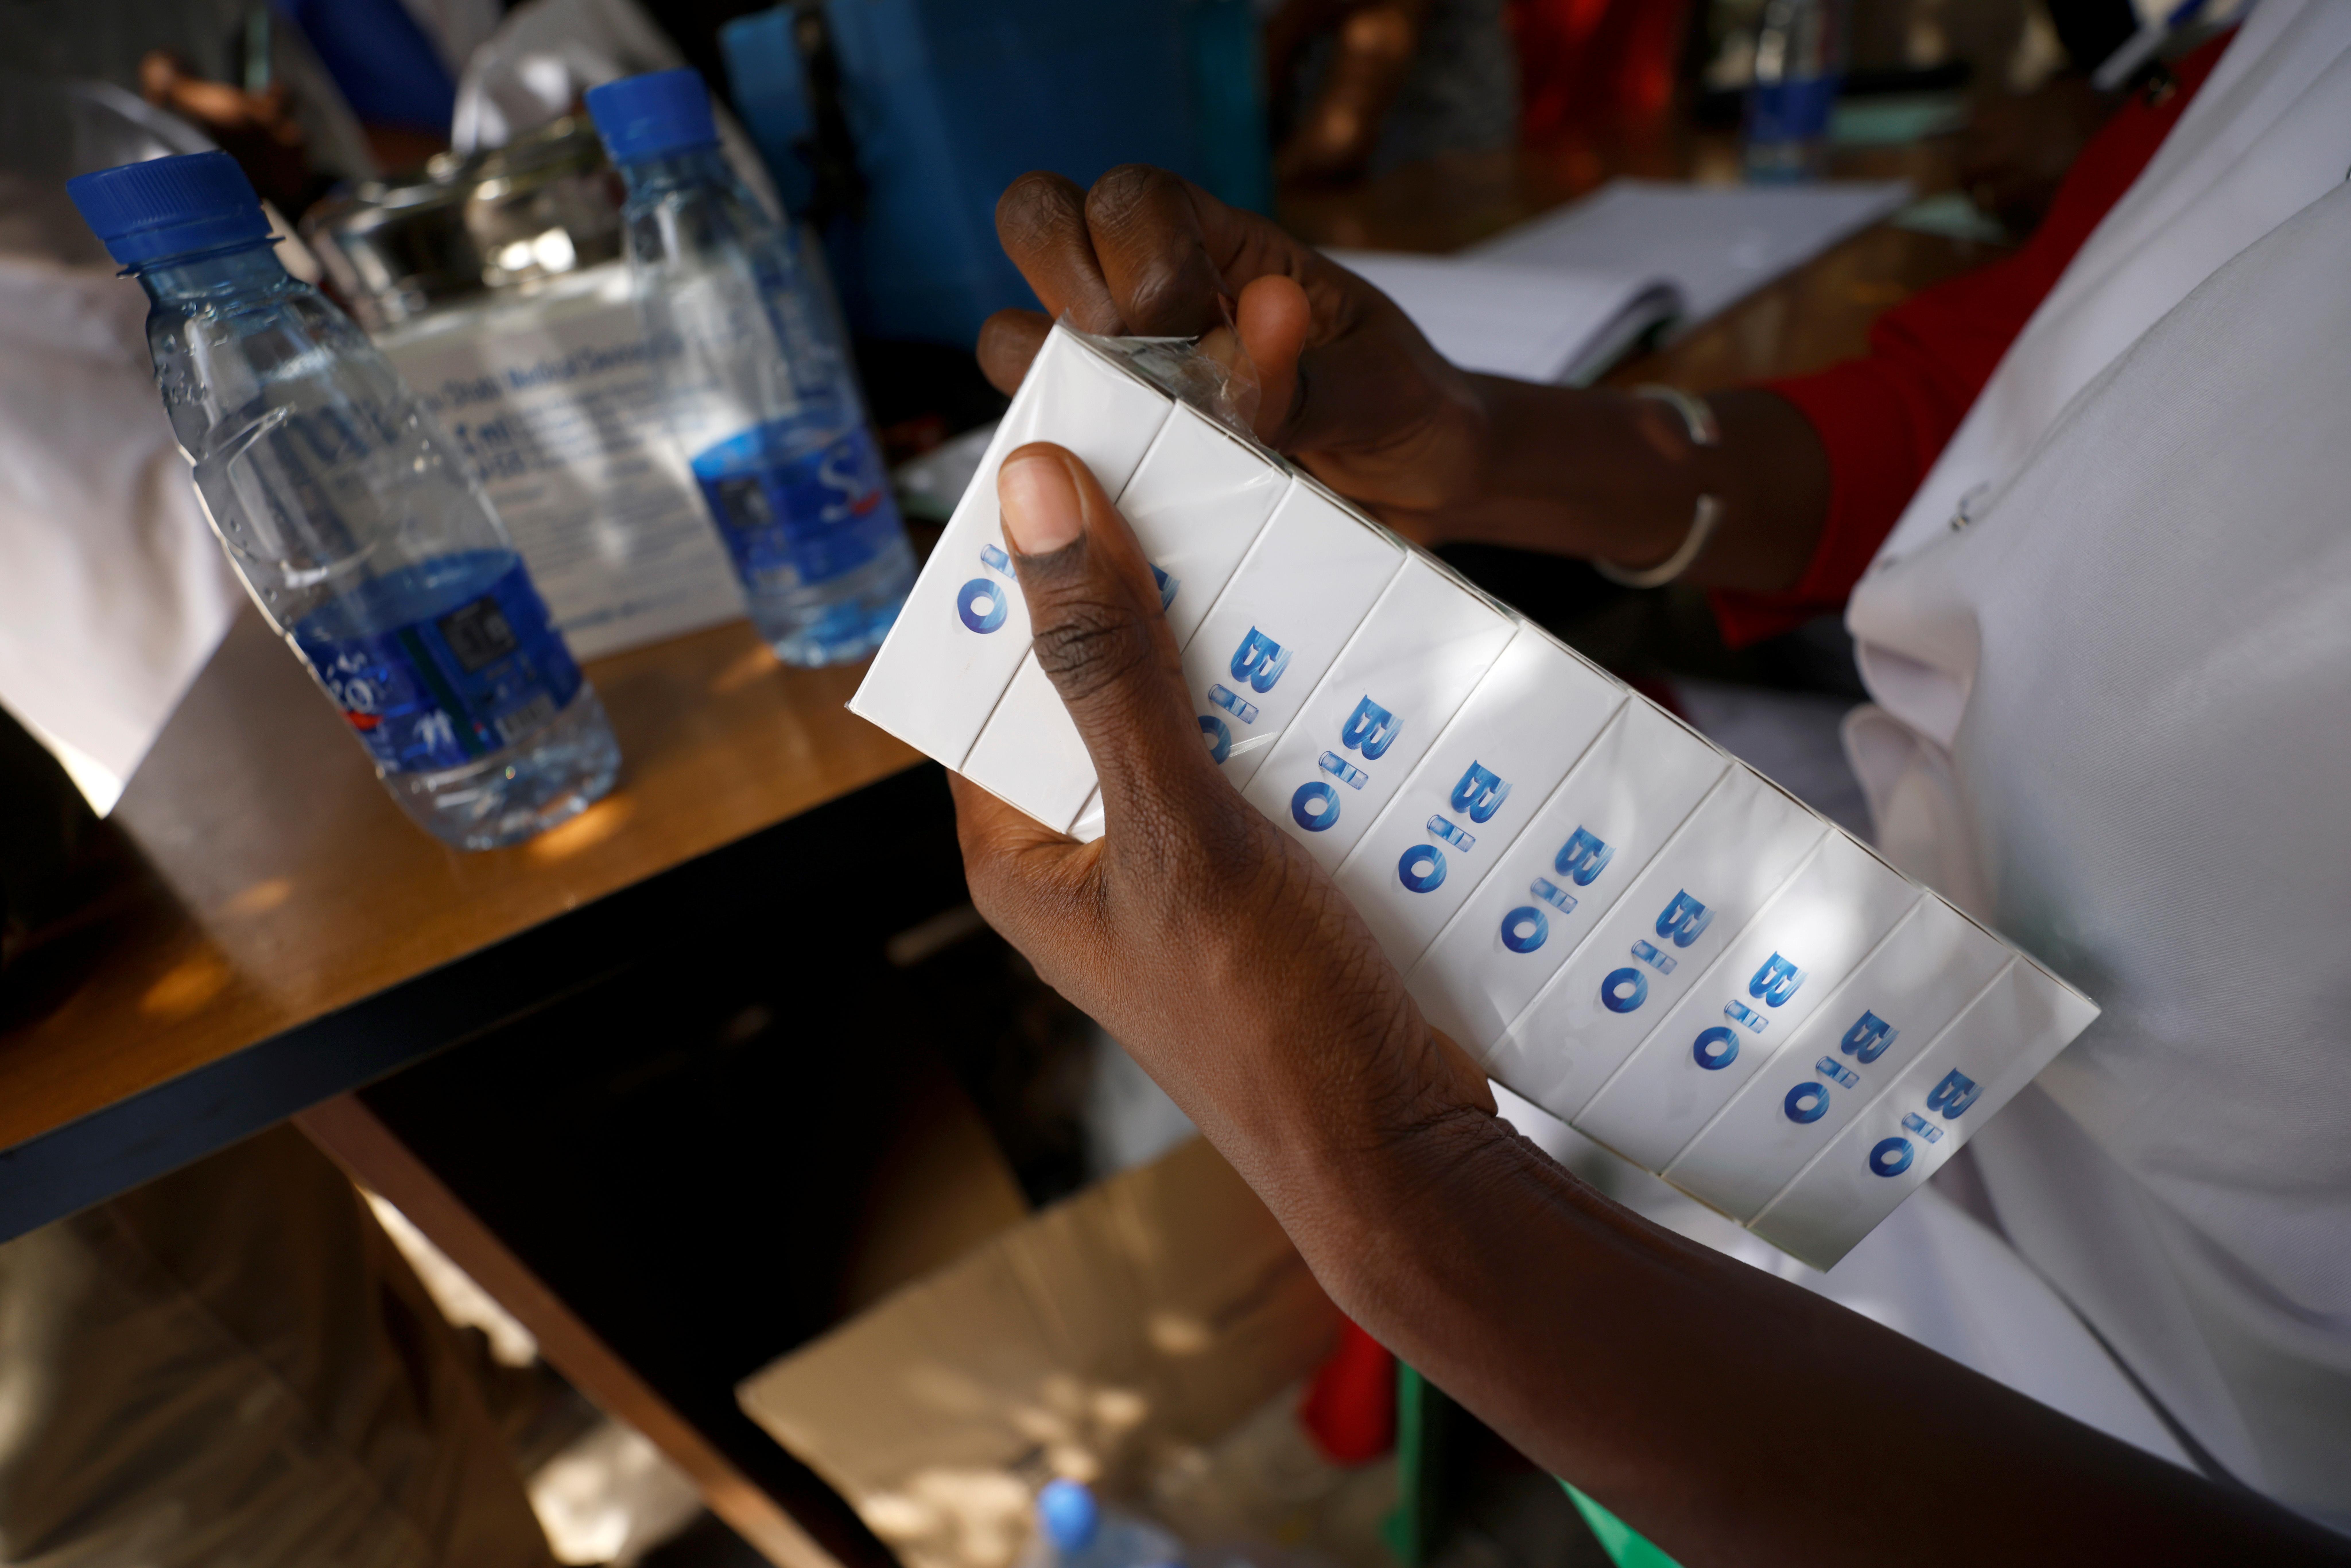 A health worker  prepares doses of coronavirus disease (COVID-19) vaccine in Dakar, Senegal February 24, 2021. REUTERS/ Zohra Bensemra